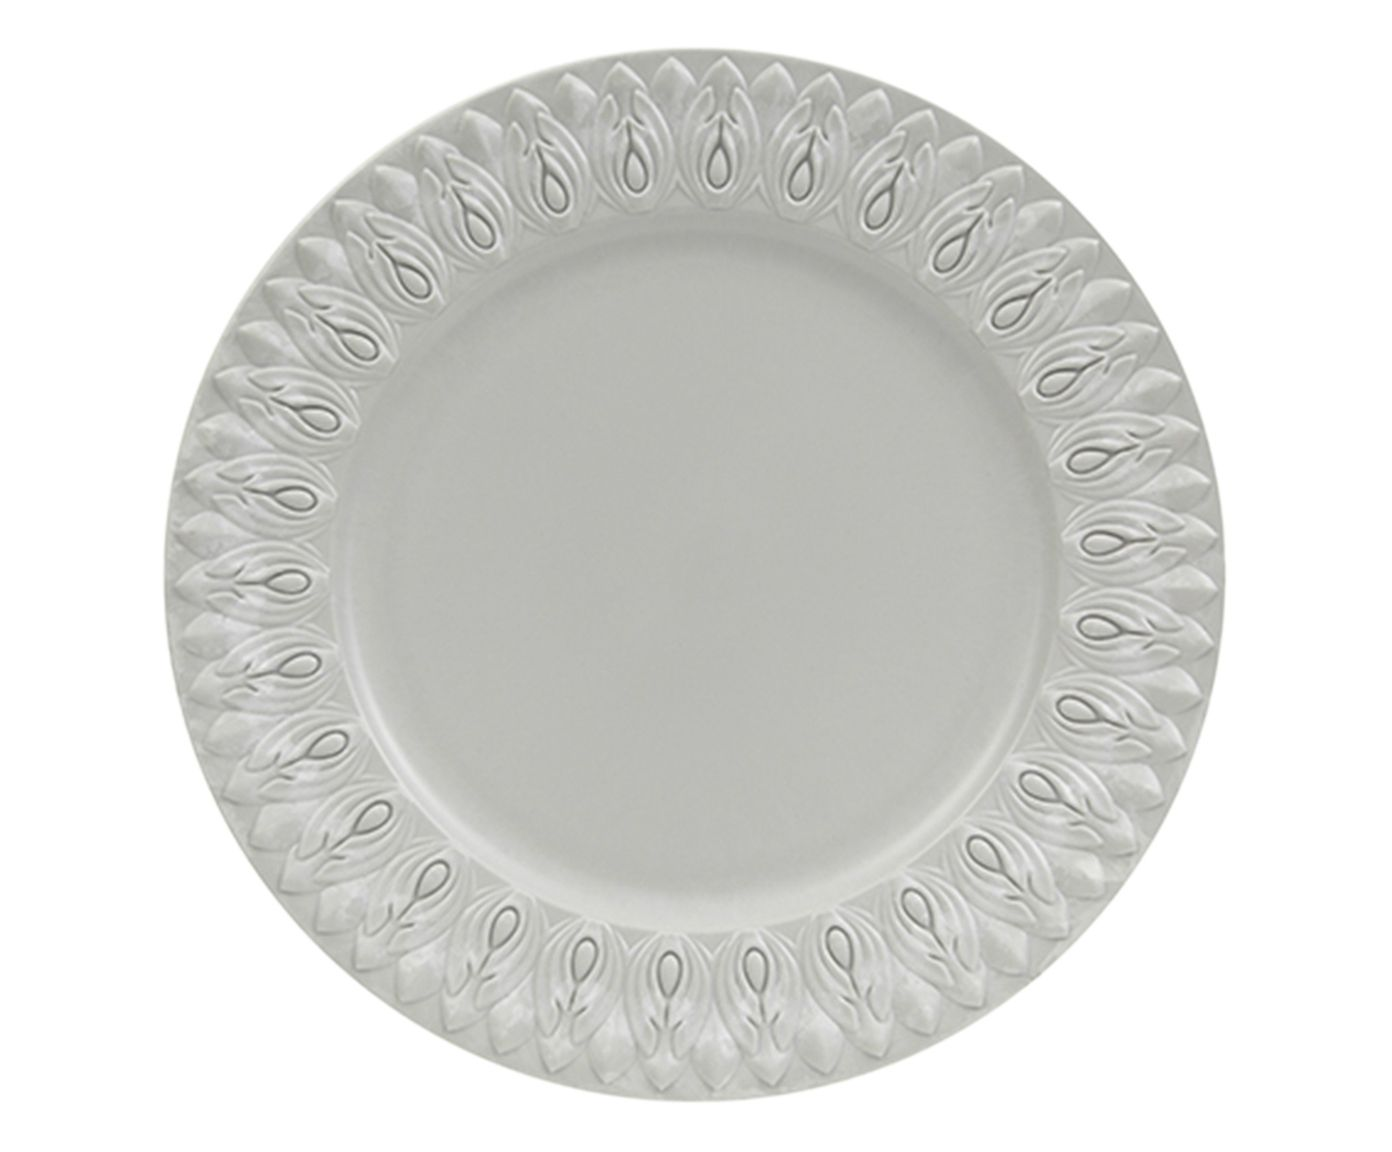 Sousplat Greco Jônico Branco - 33cm | Westwing.com.br